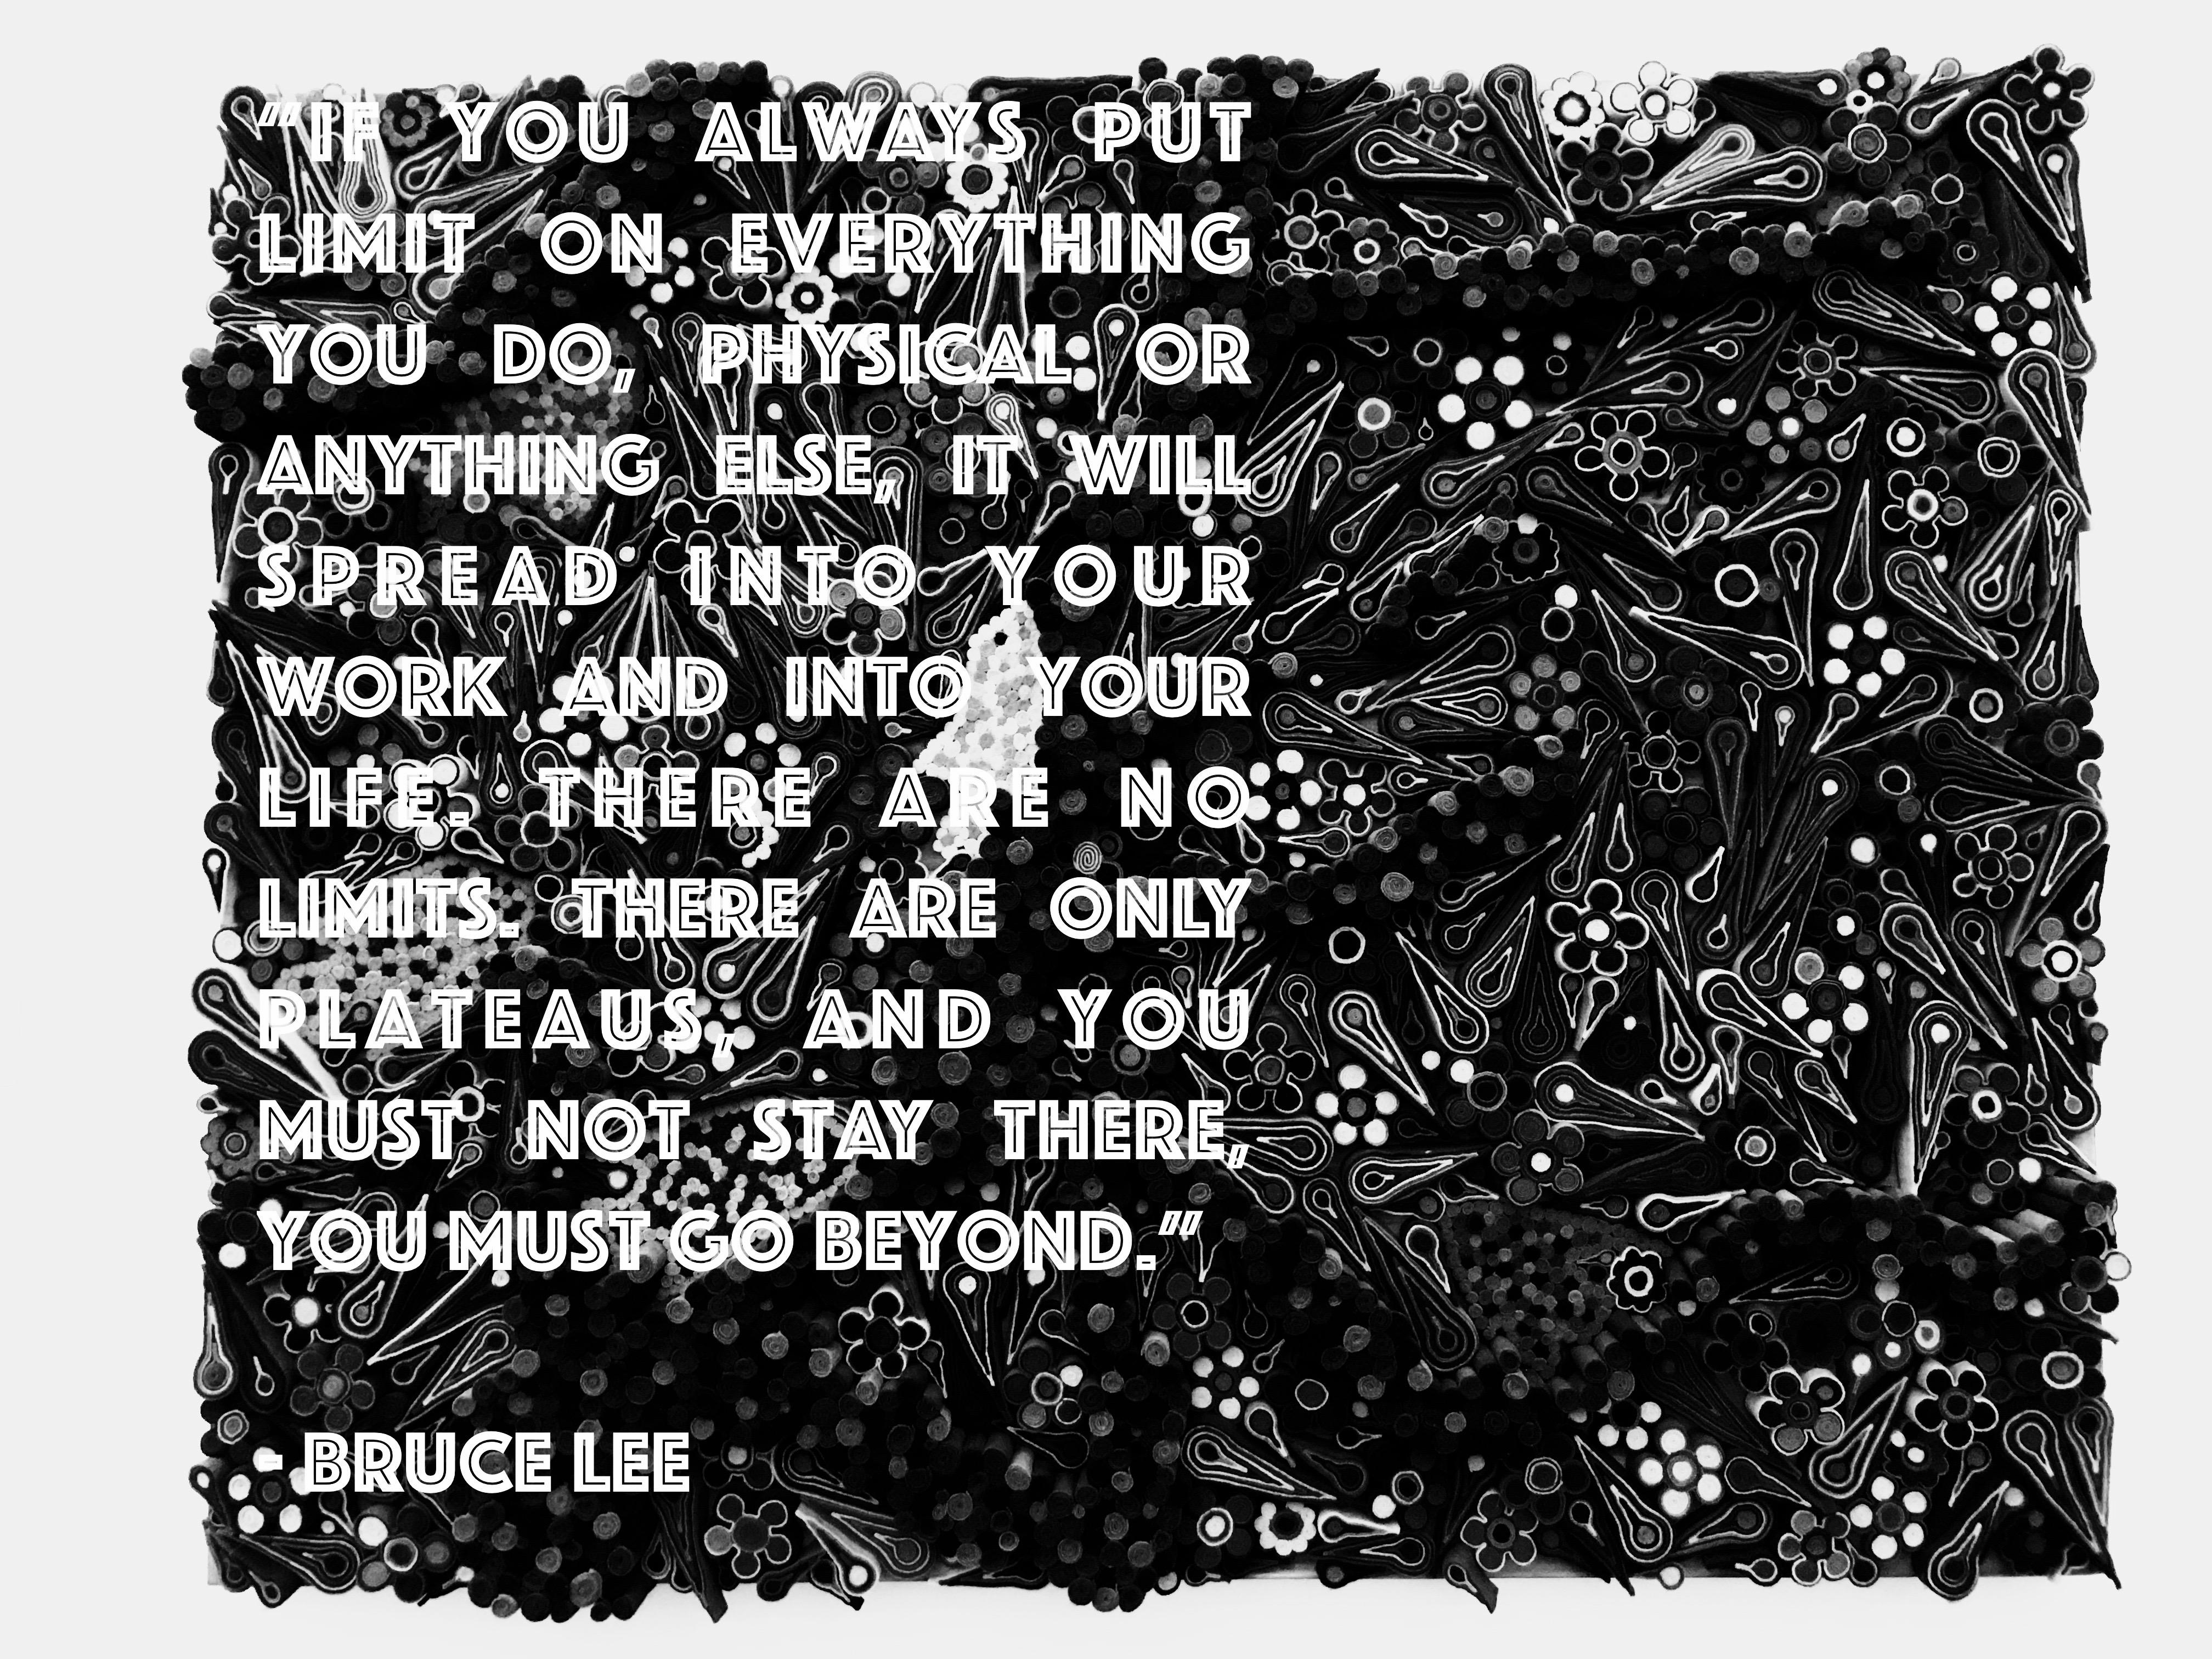 bruce_lee_image_quotation